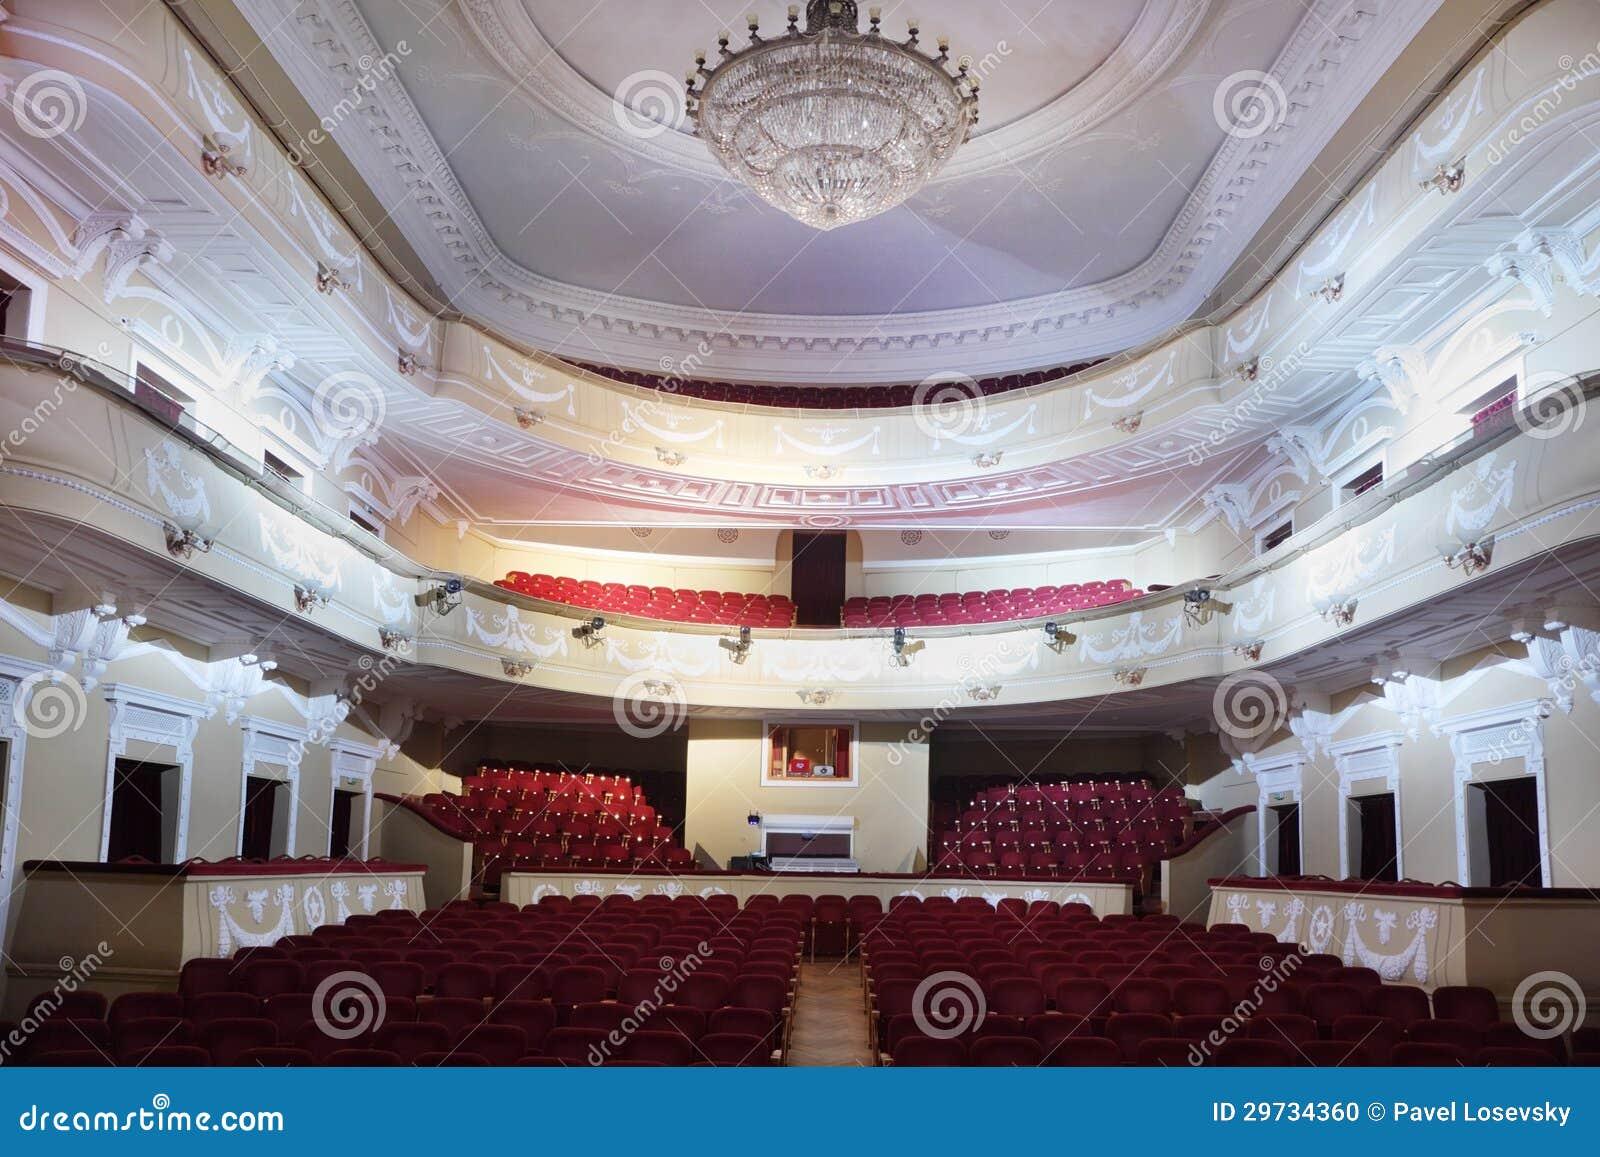 Moscow january 27 empty hall in palace on yauza on january 27 2012